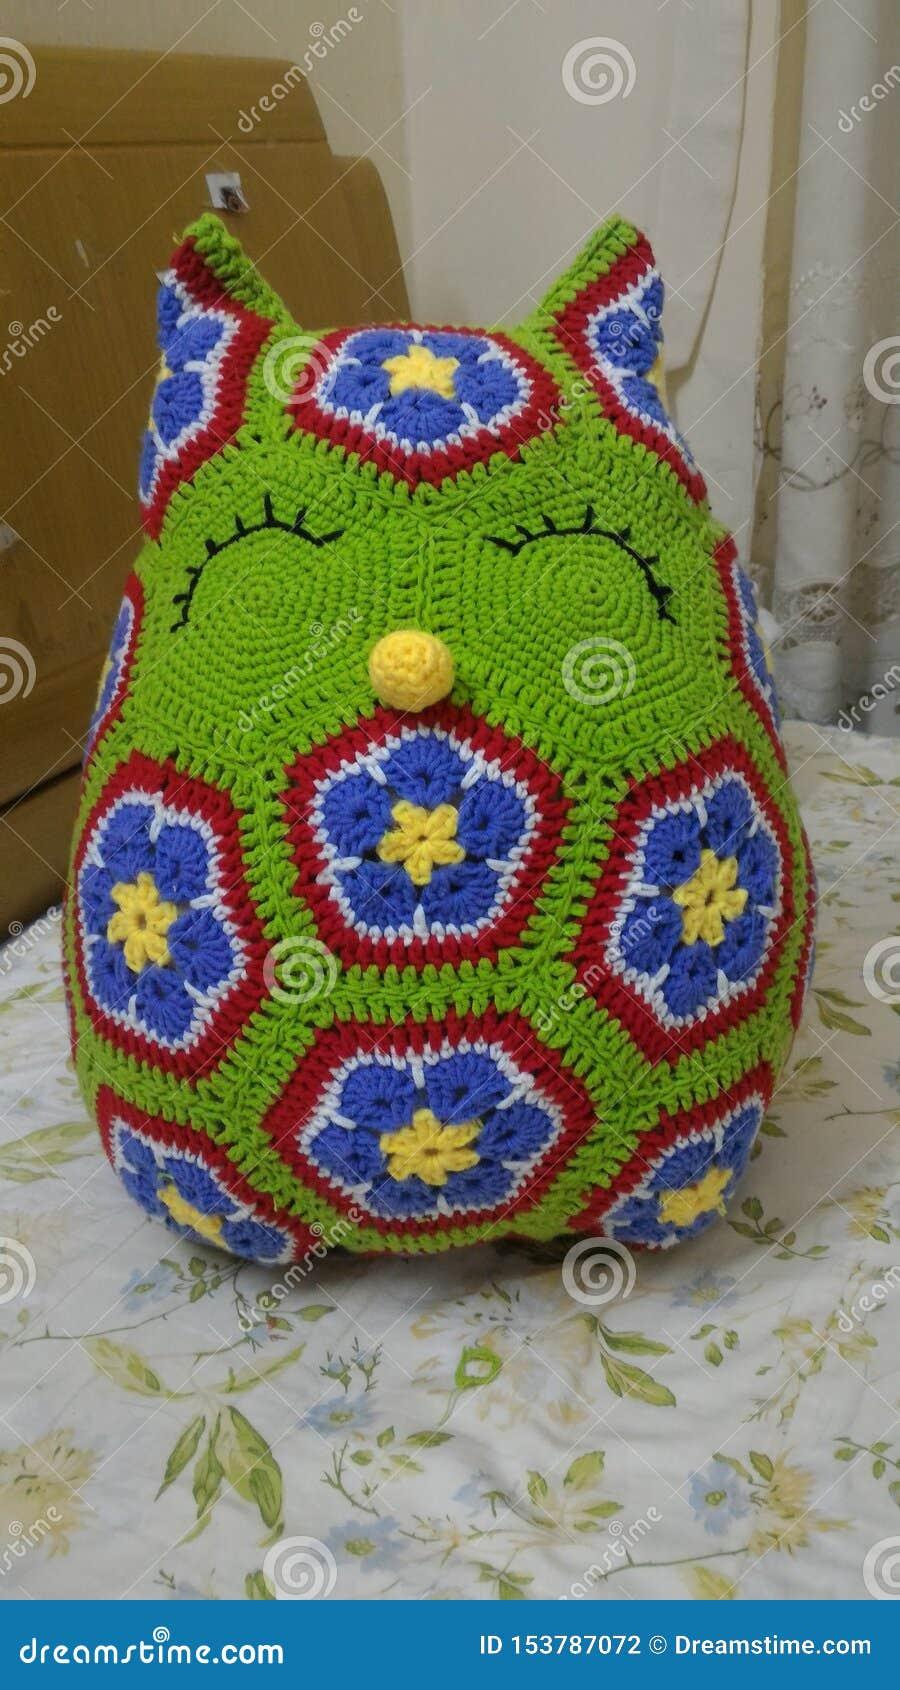 6 Fun Animal Cat Pillow Free Crochet Pattern and Paid – – #Animal ... | 1689x900